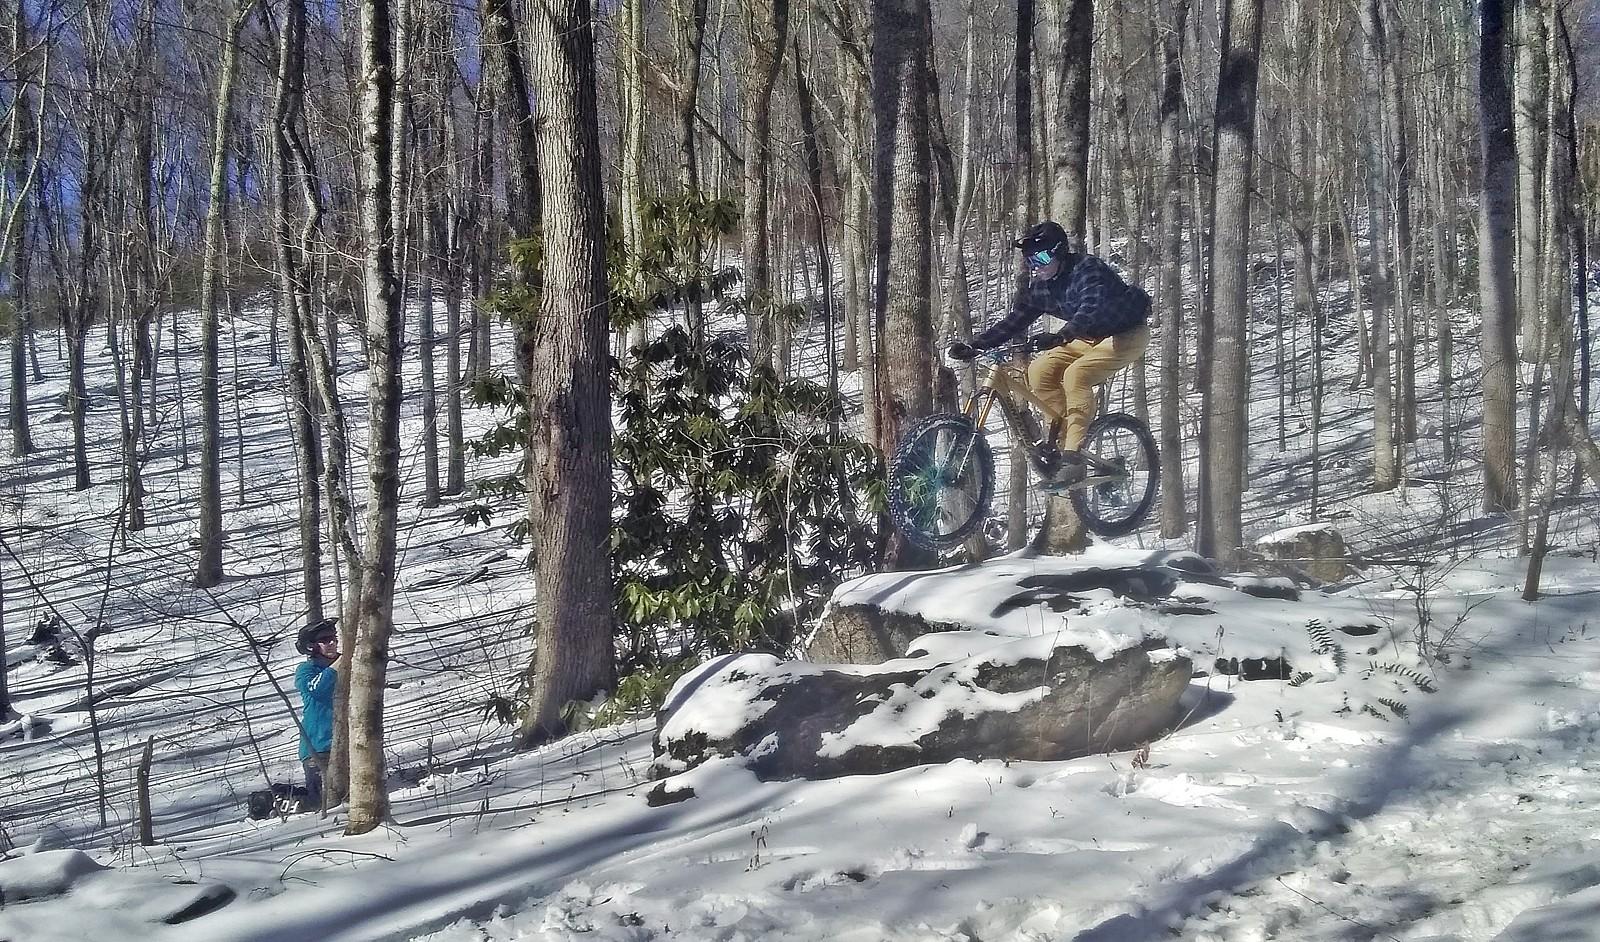 Winter in WNC - corey.carpentier - Mountain Biking Pictures - Vital MTB